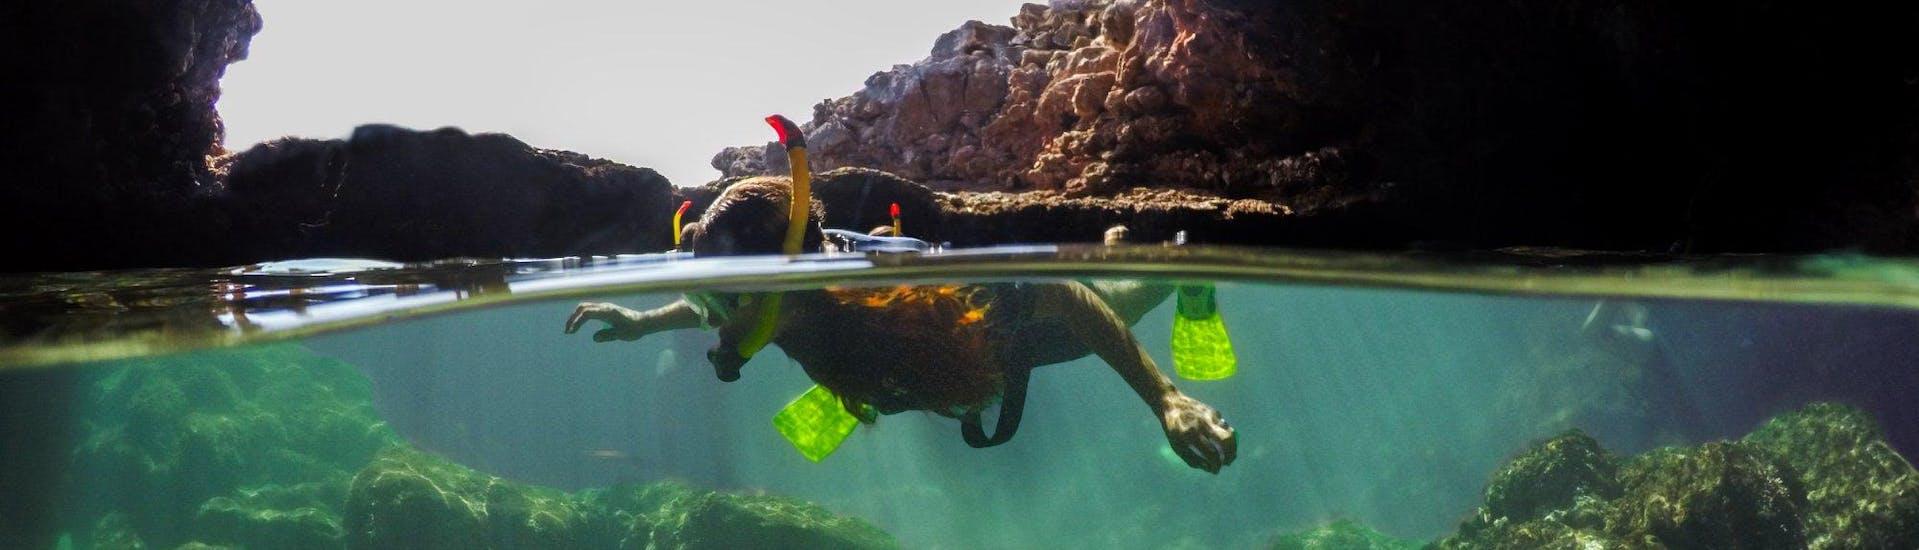 Esnórquel en Porto Cristo con Skualo Diving Watersports Mallorca - Hero image